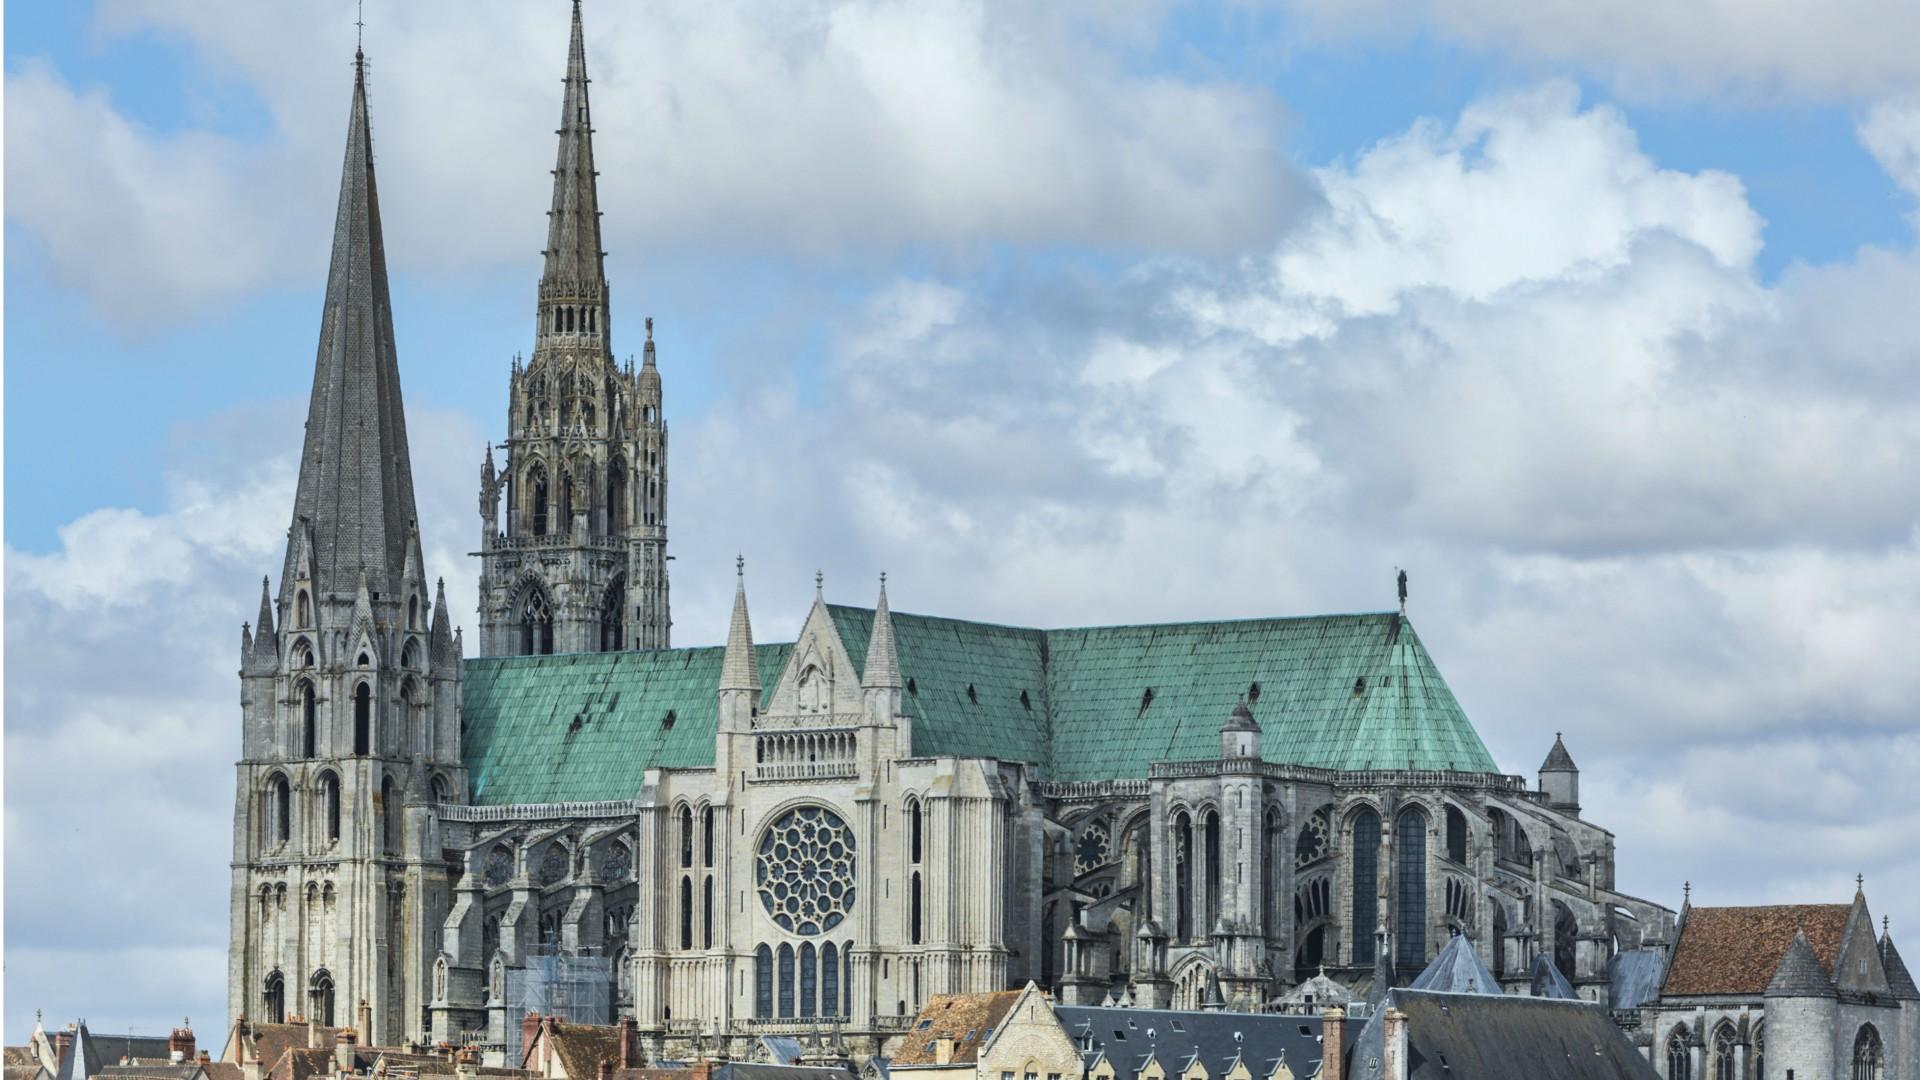 Cathédrale Notre Dame, France